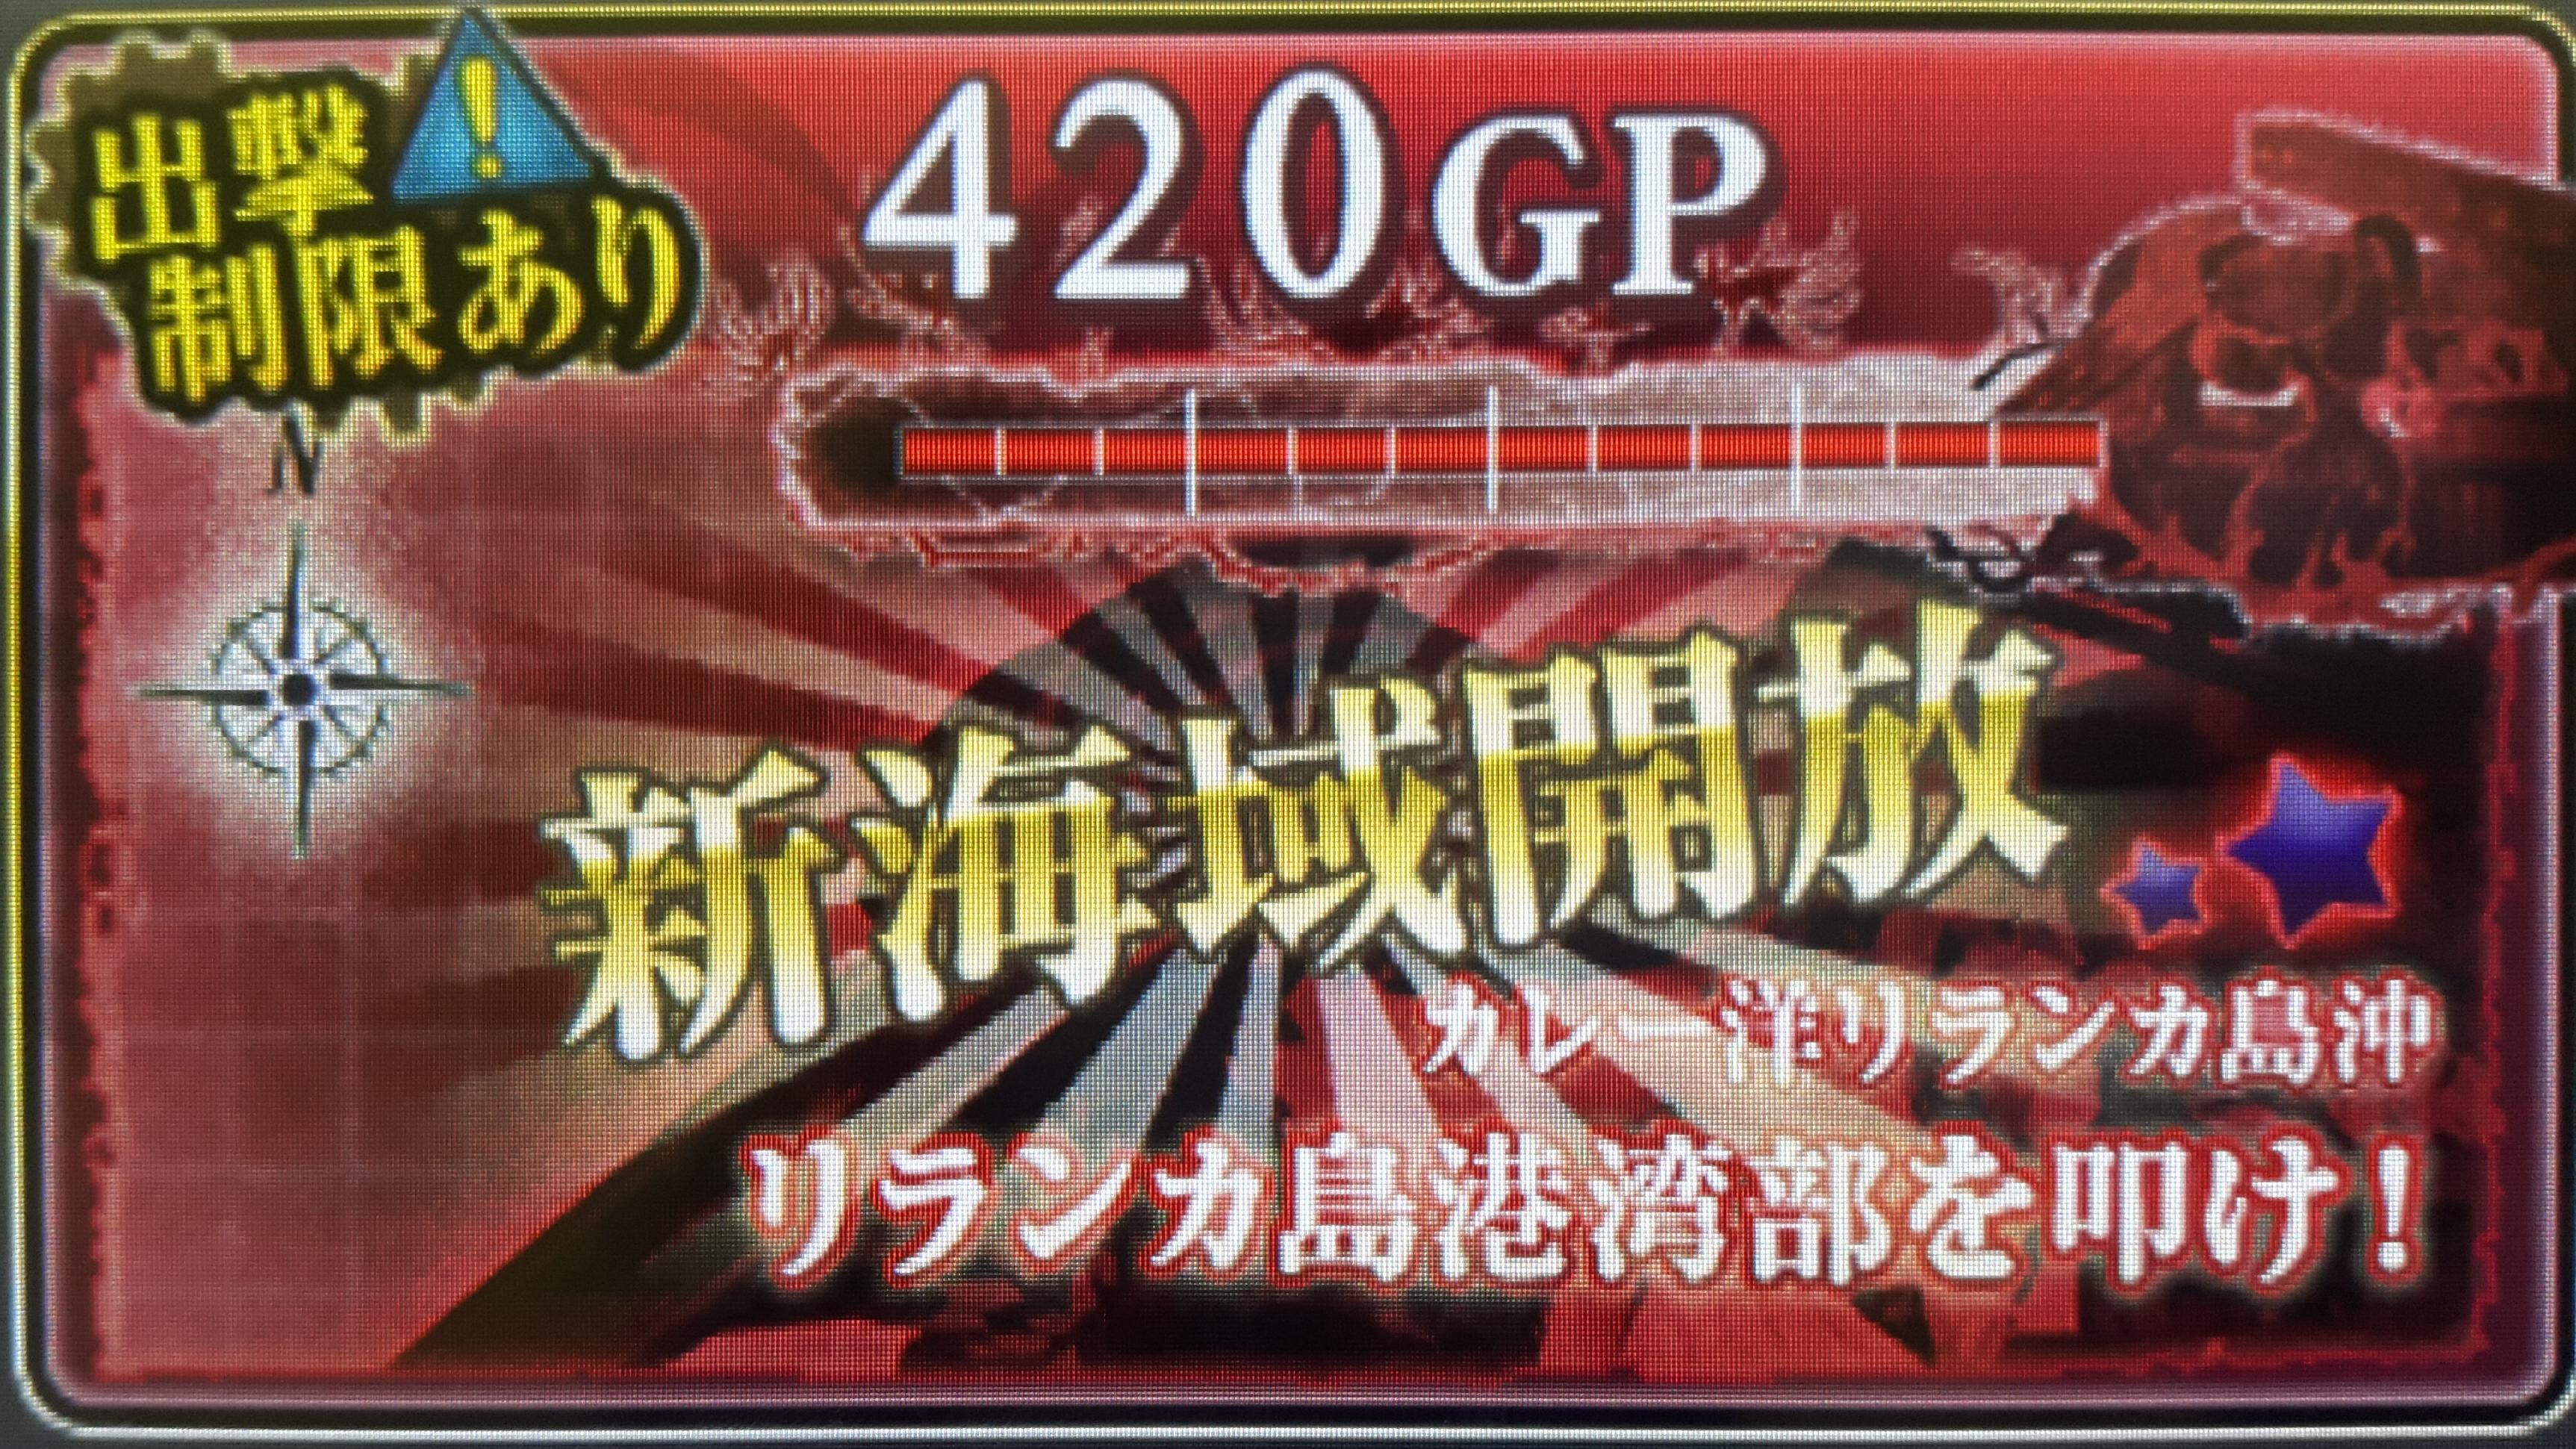 【AC】E5 リランカ島港湾部を叩け!(甲作戦)攻略